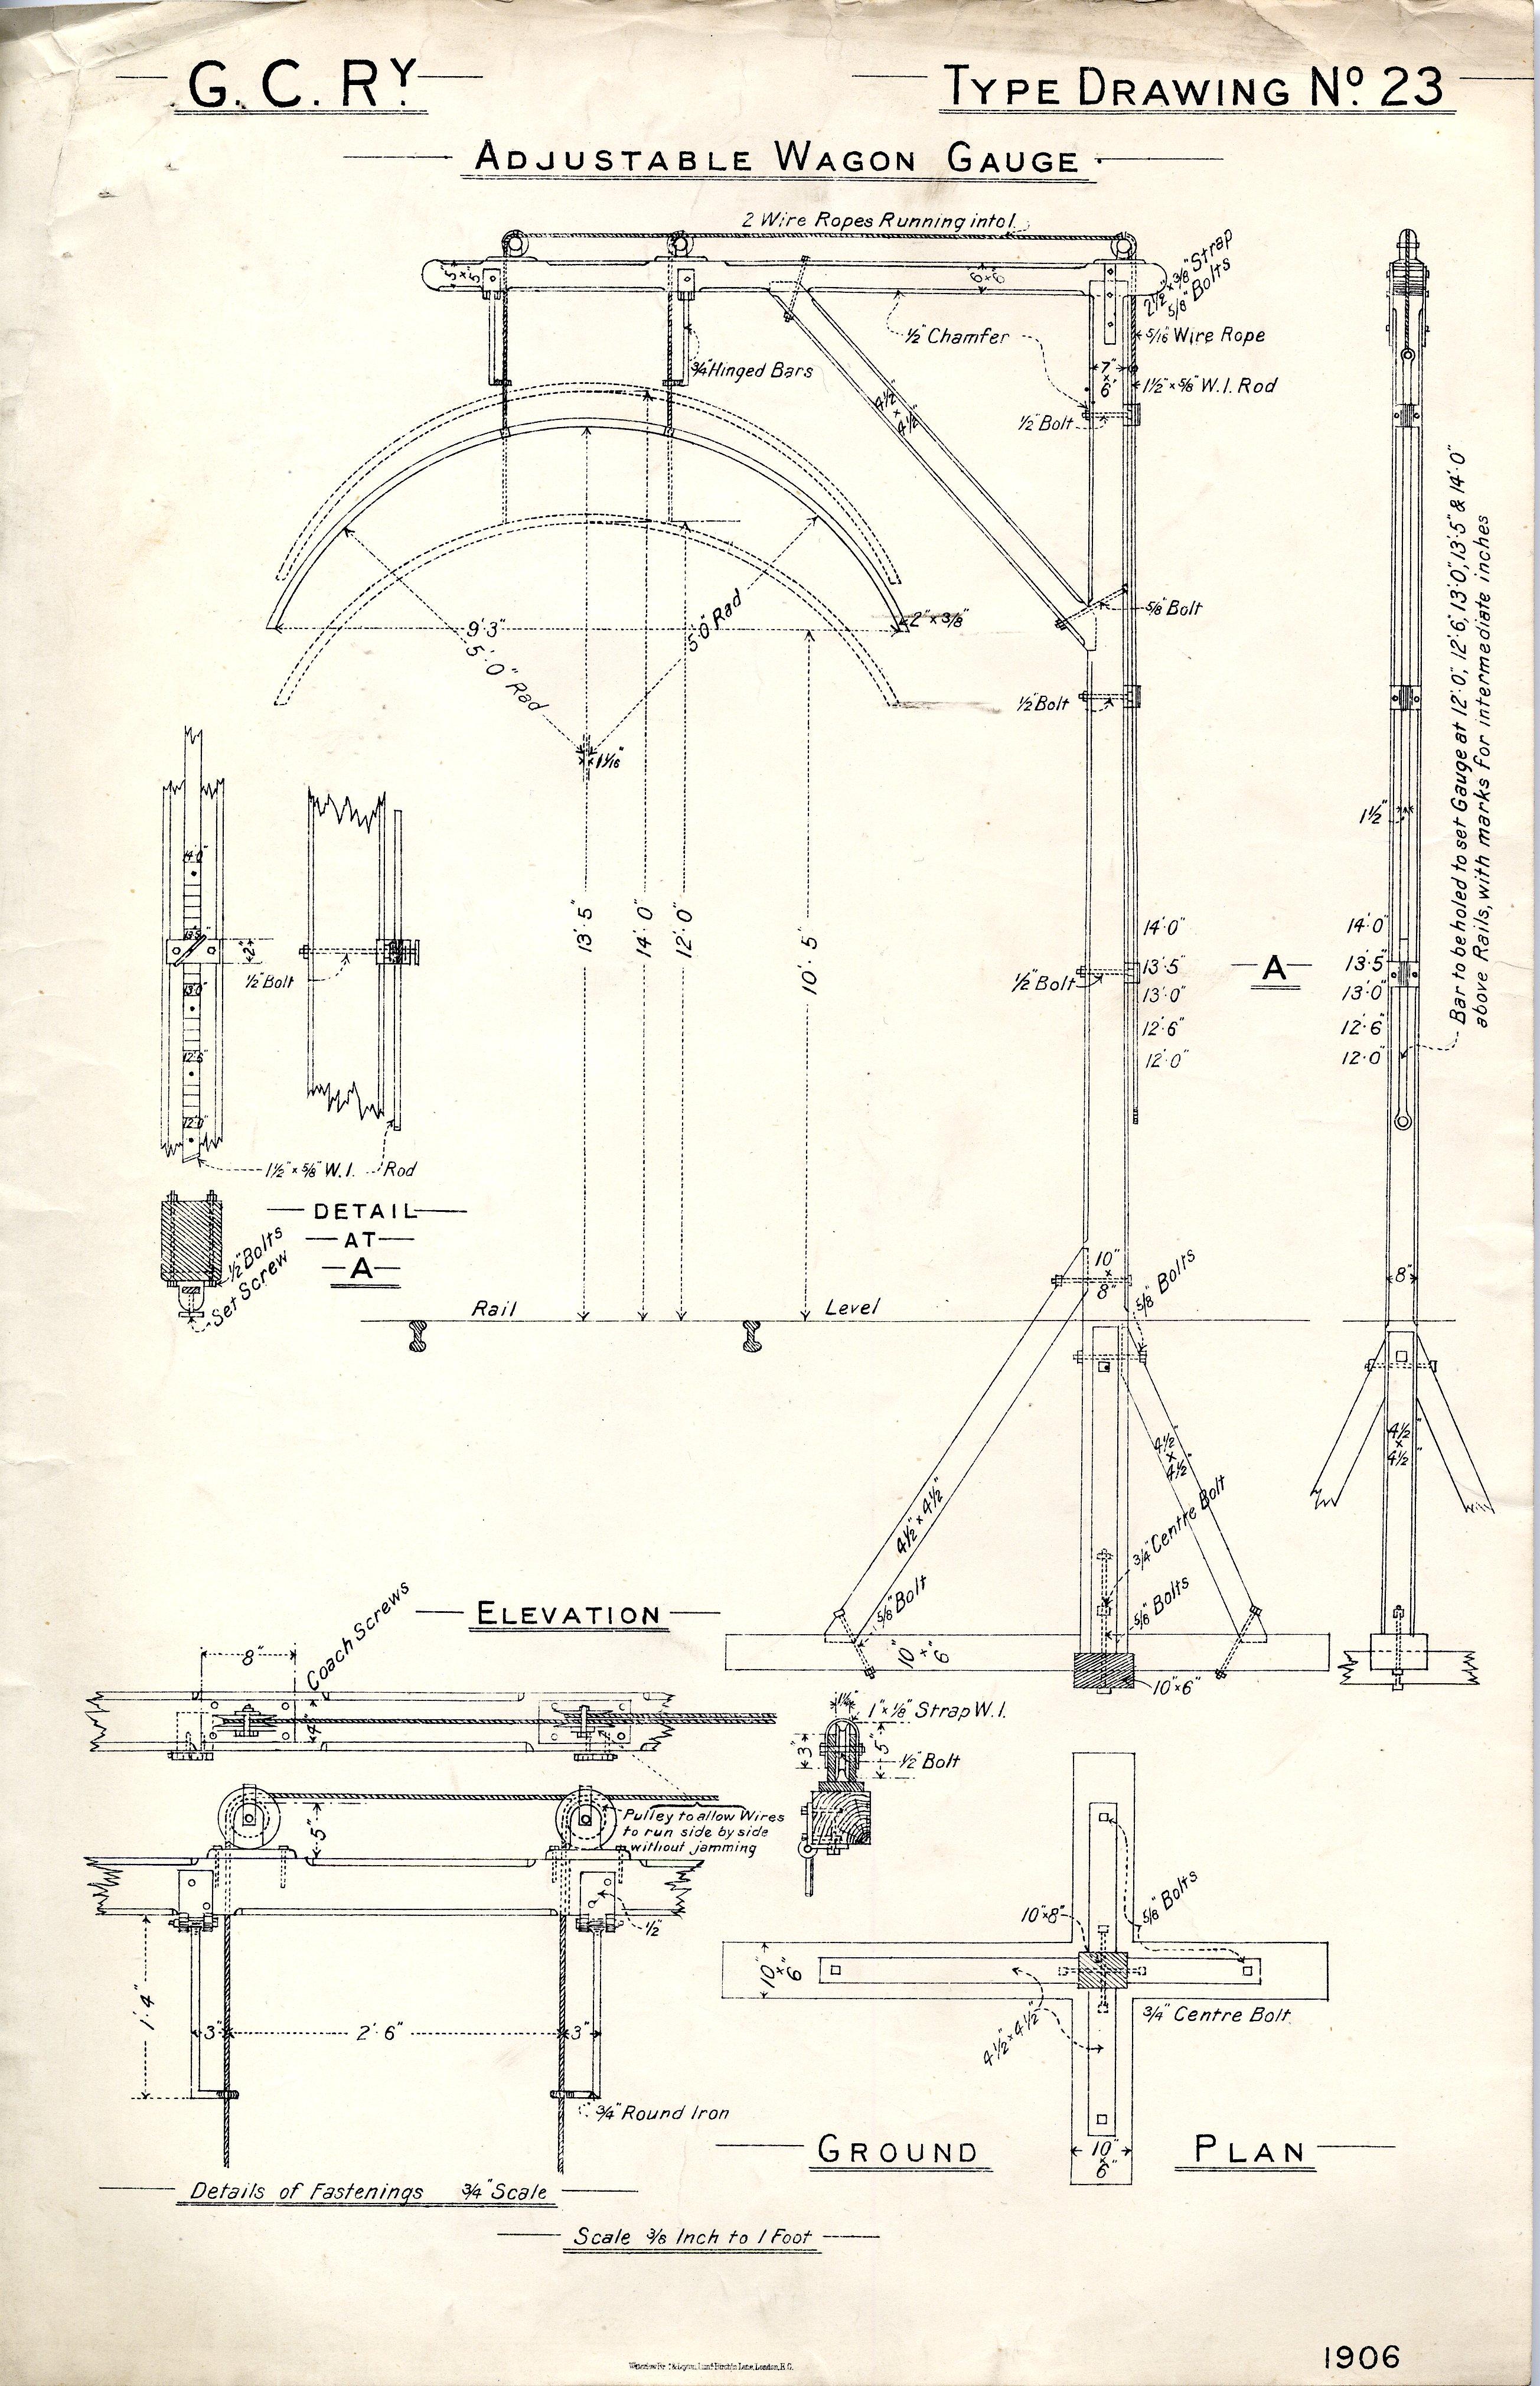 M S  & L  Ry  / G C Ry  Type Drawings